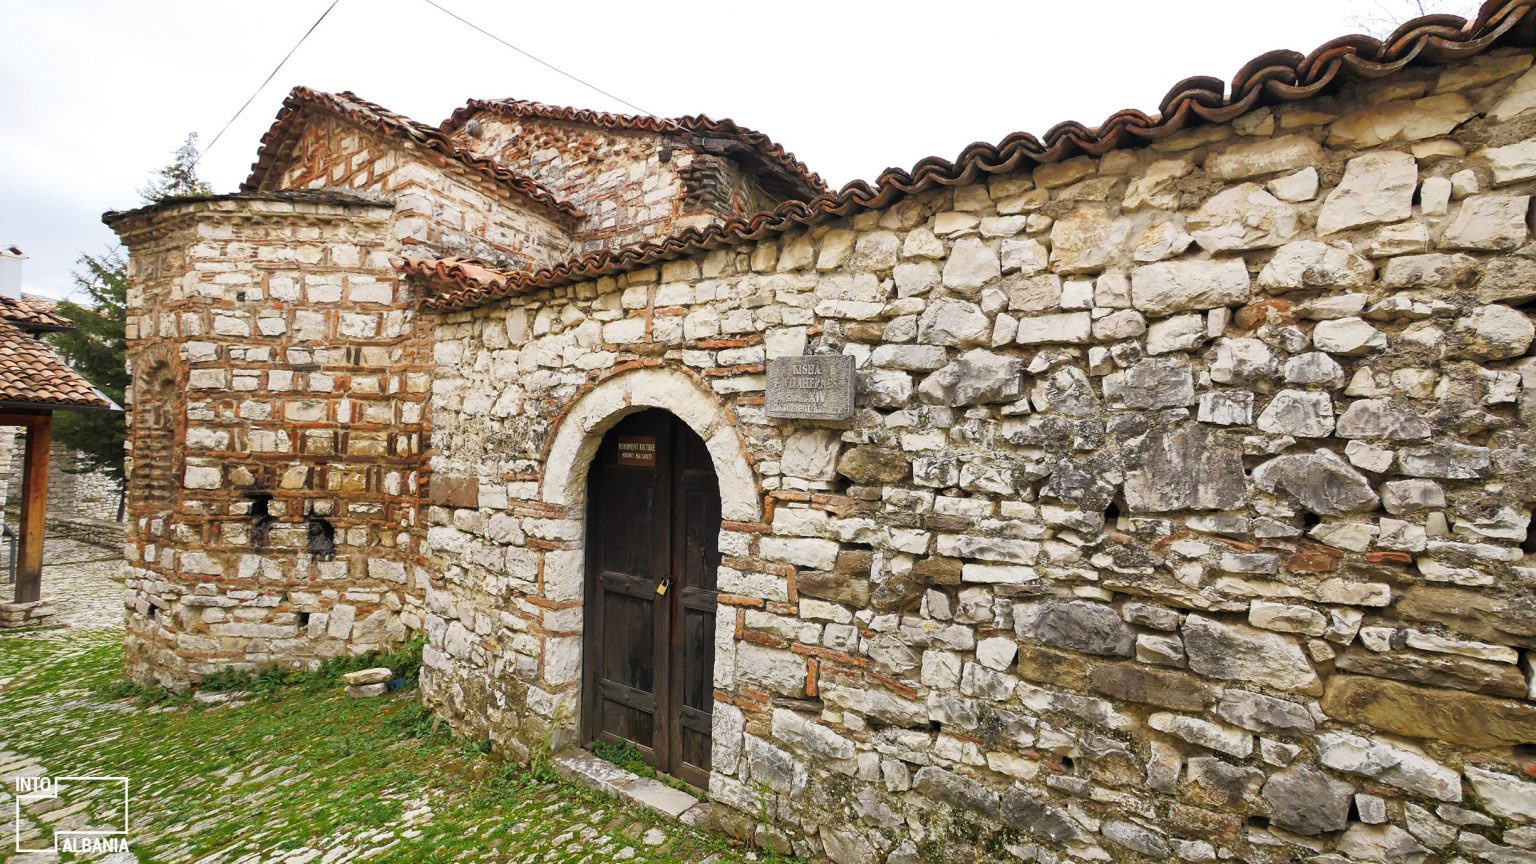 Kalaja e Beratit, foto nga IntoAlbania